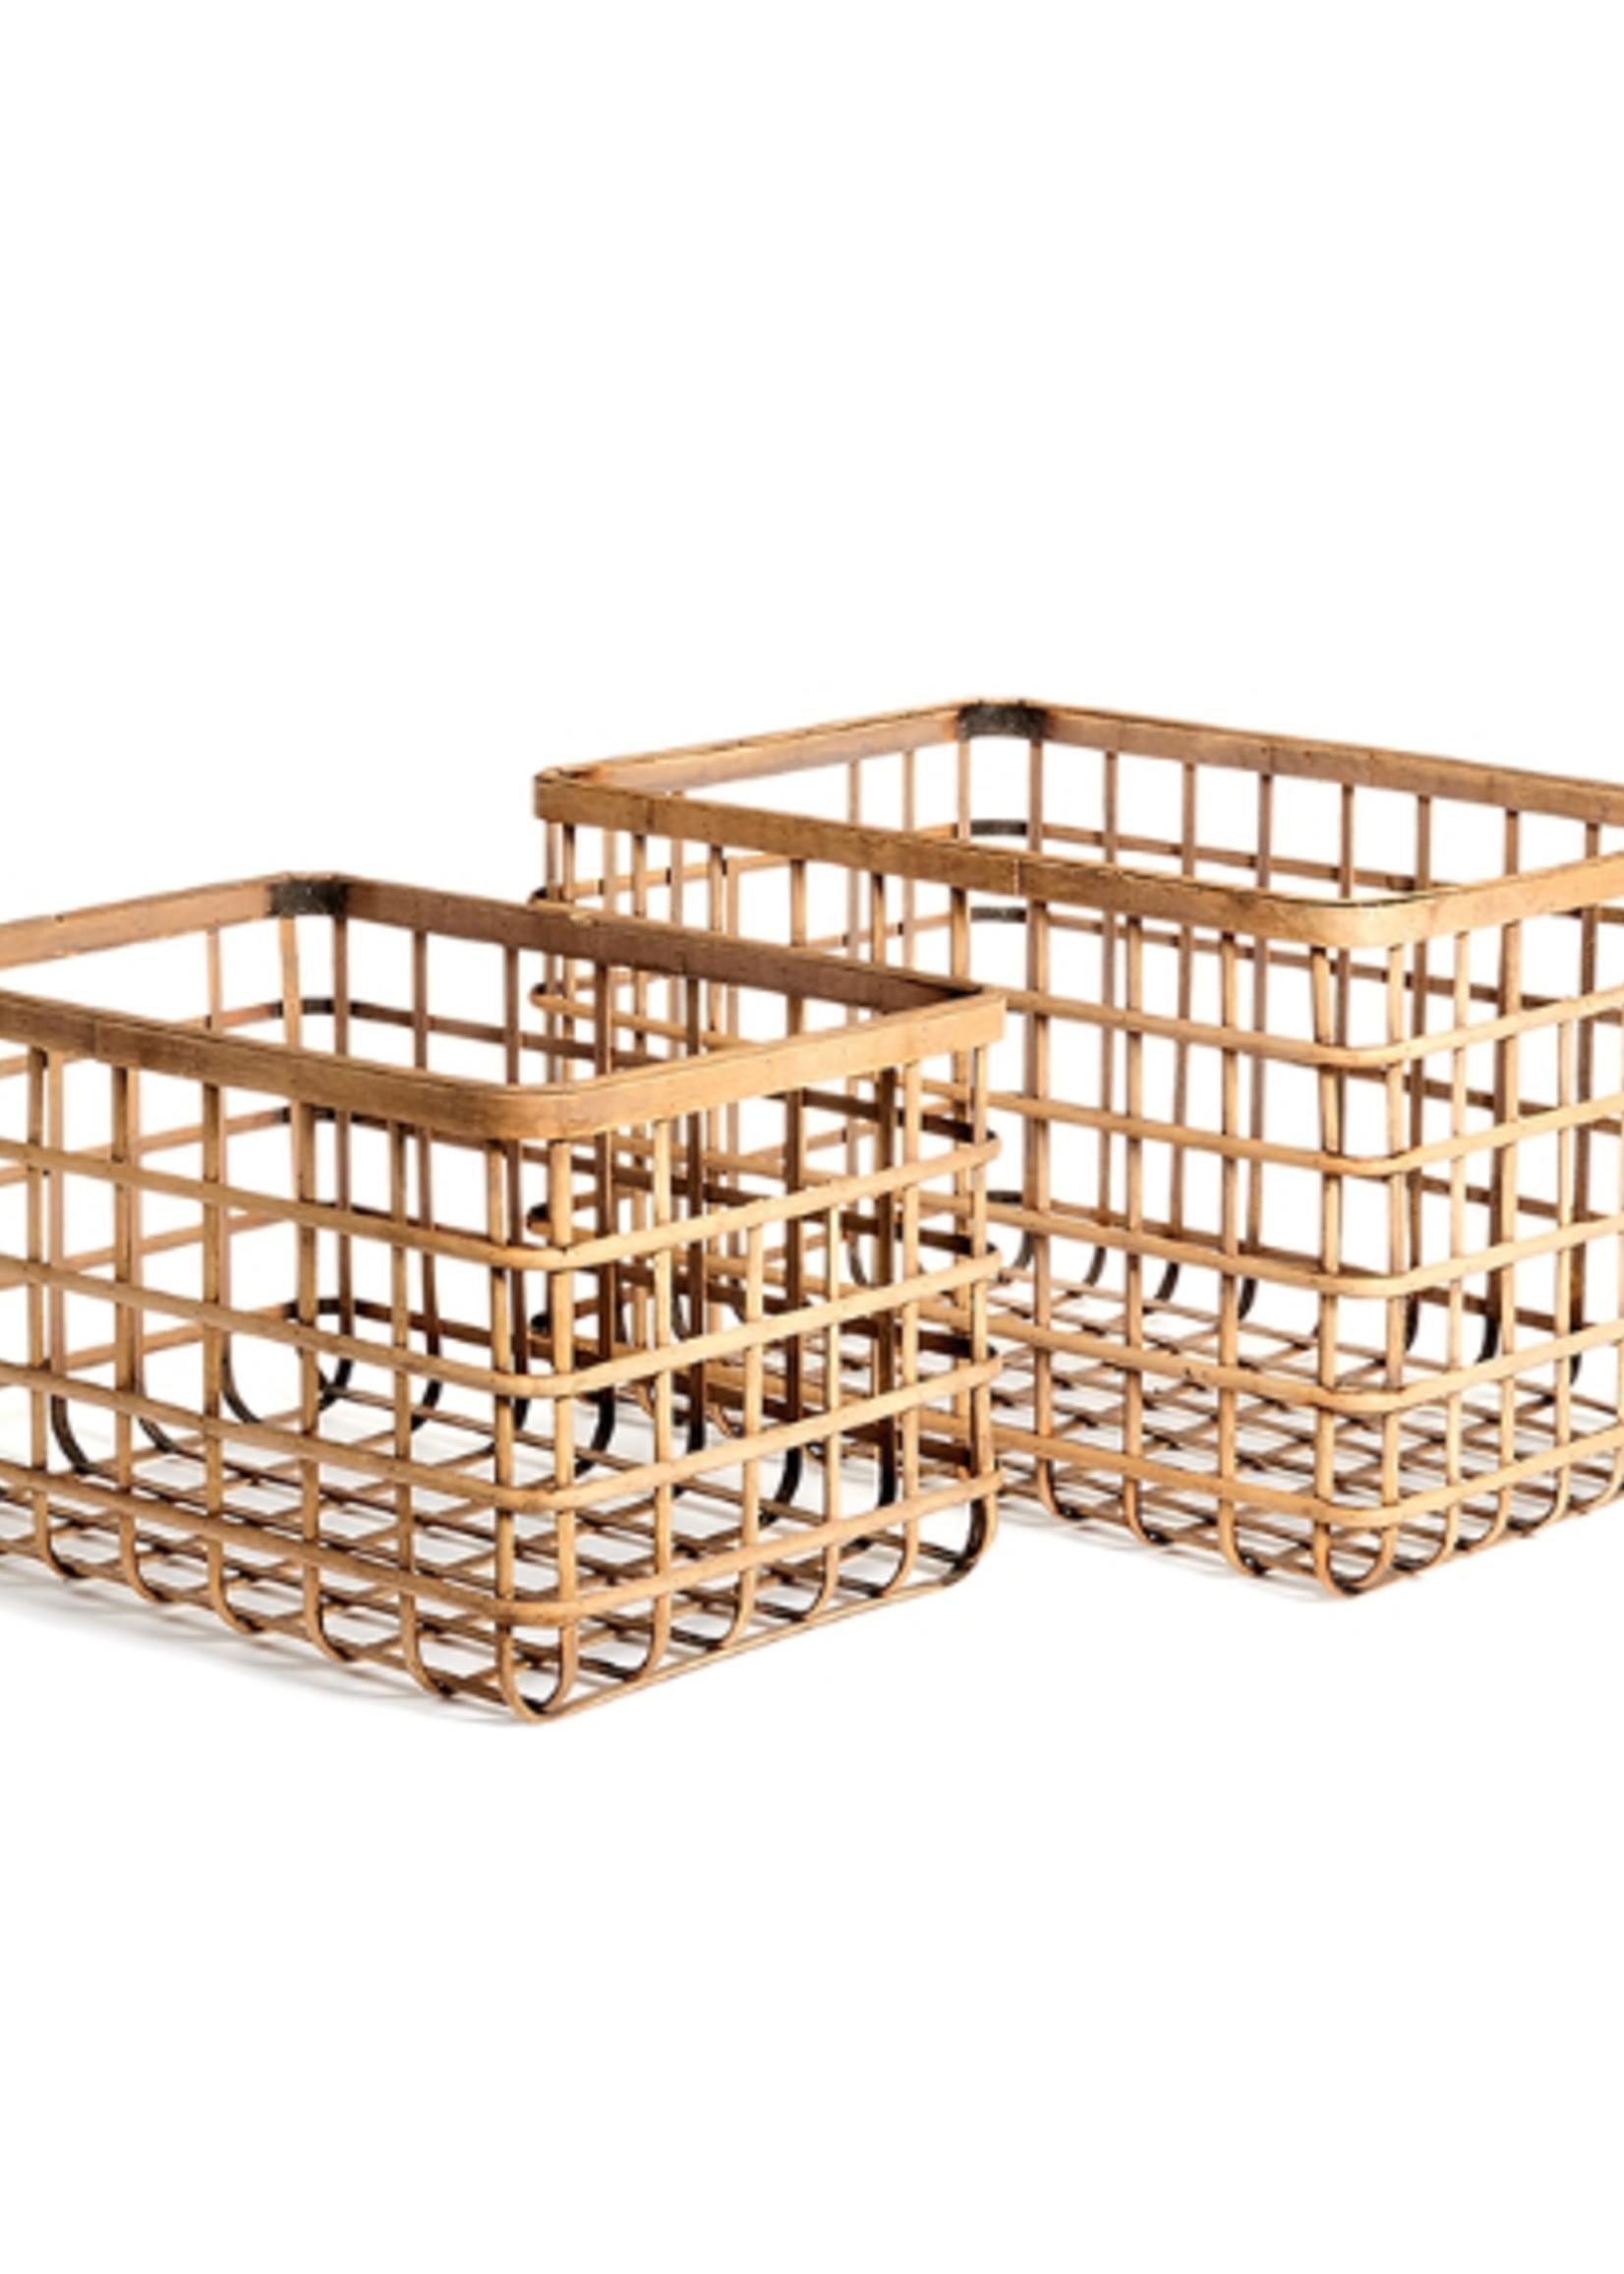 River Bamboo Basket Small